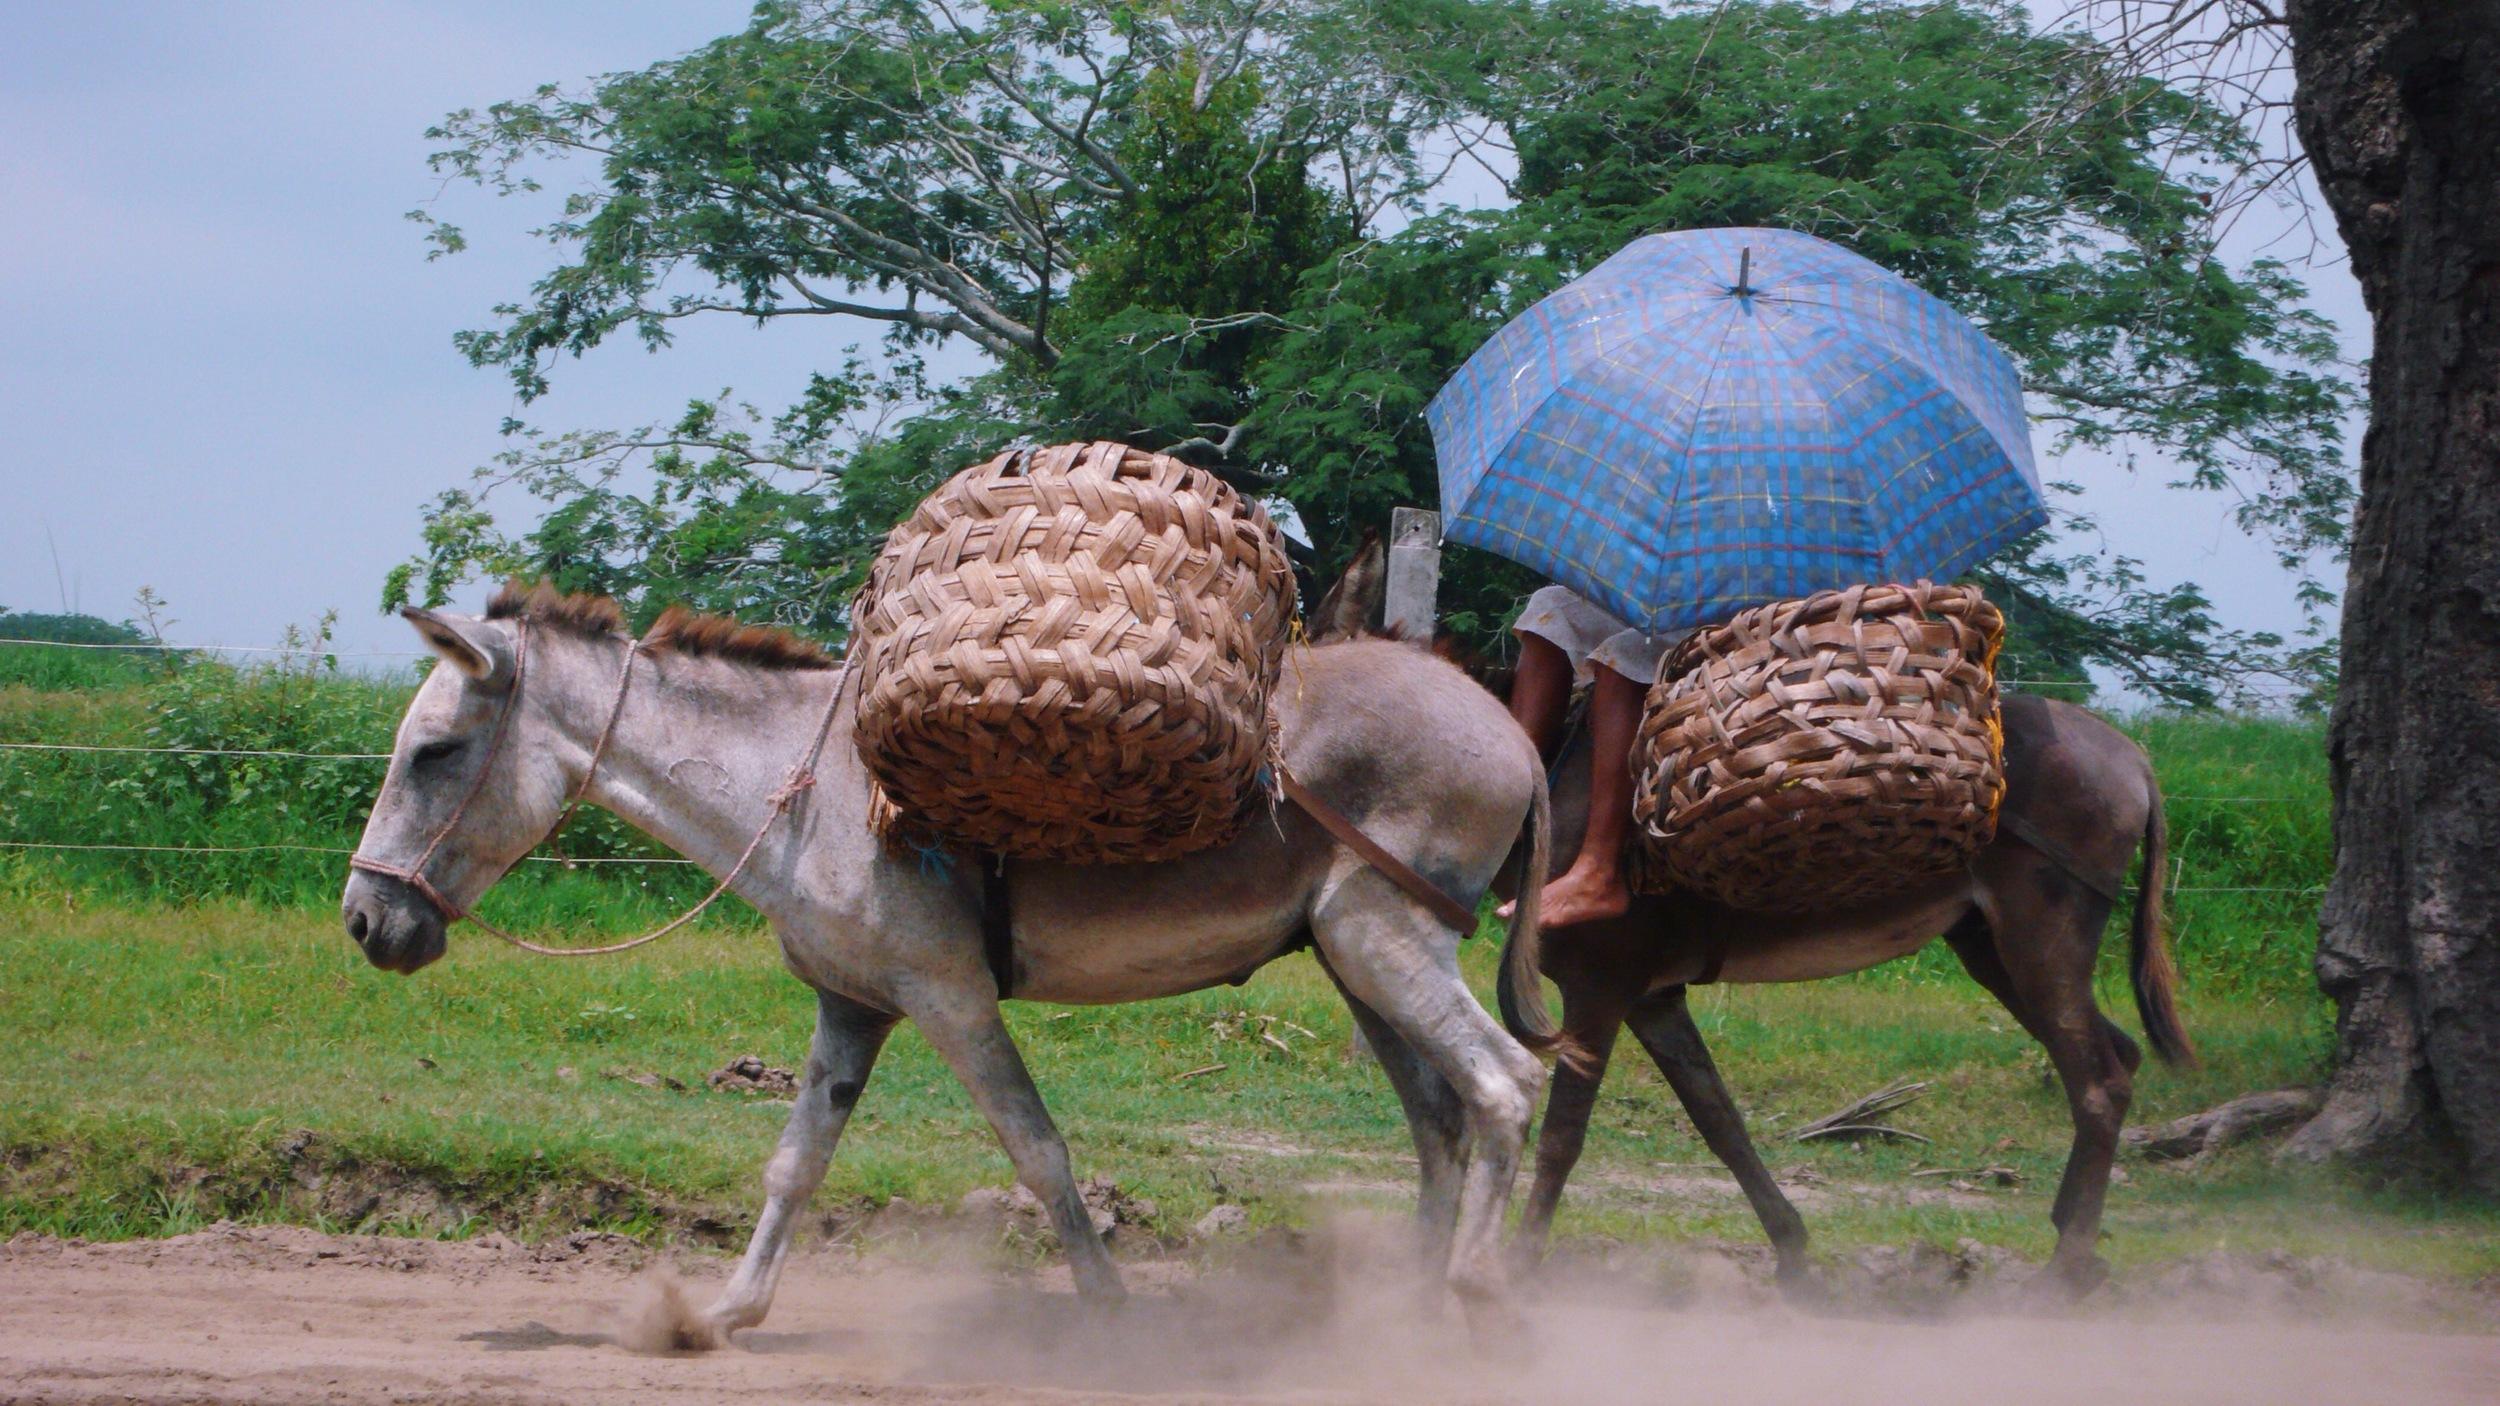 colombia donkey and umbrella.jpg